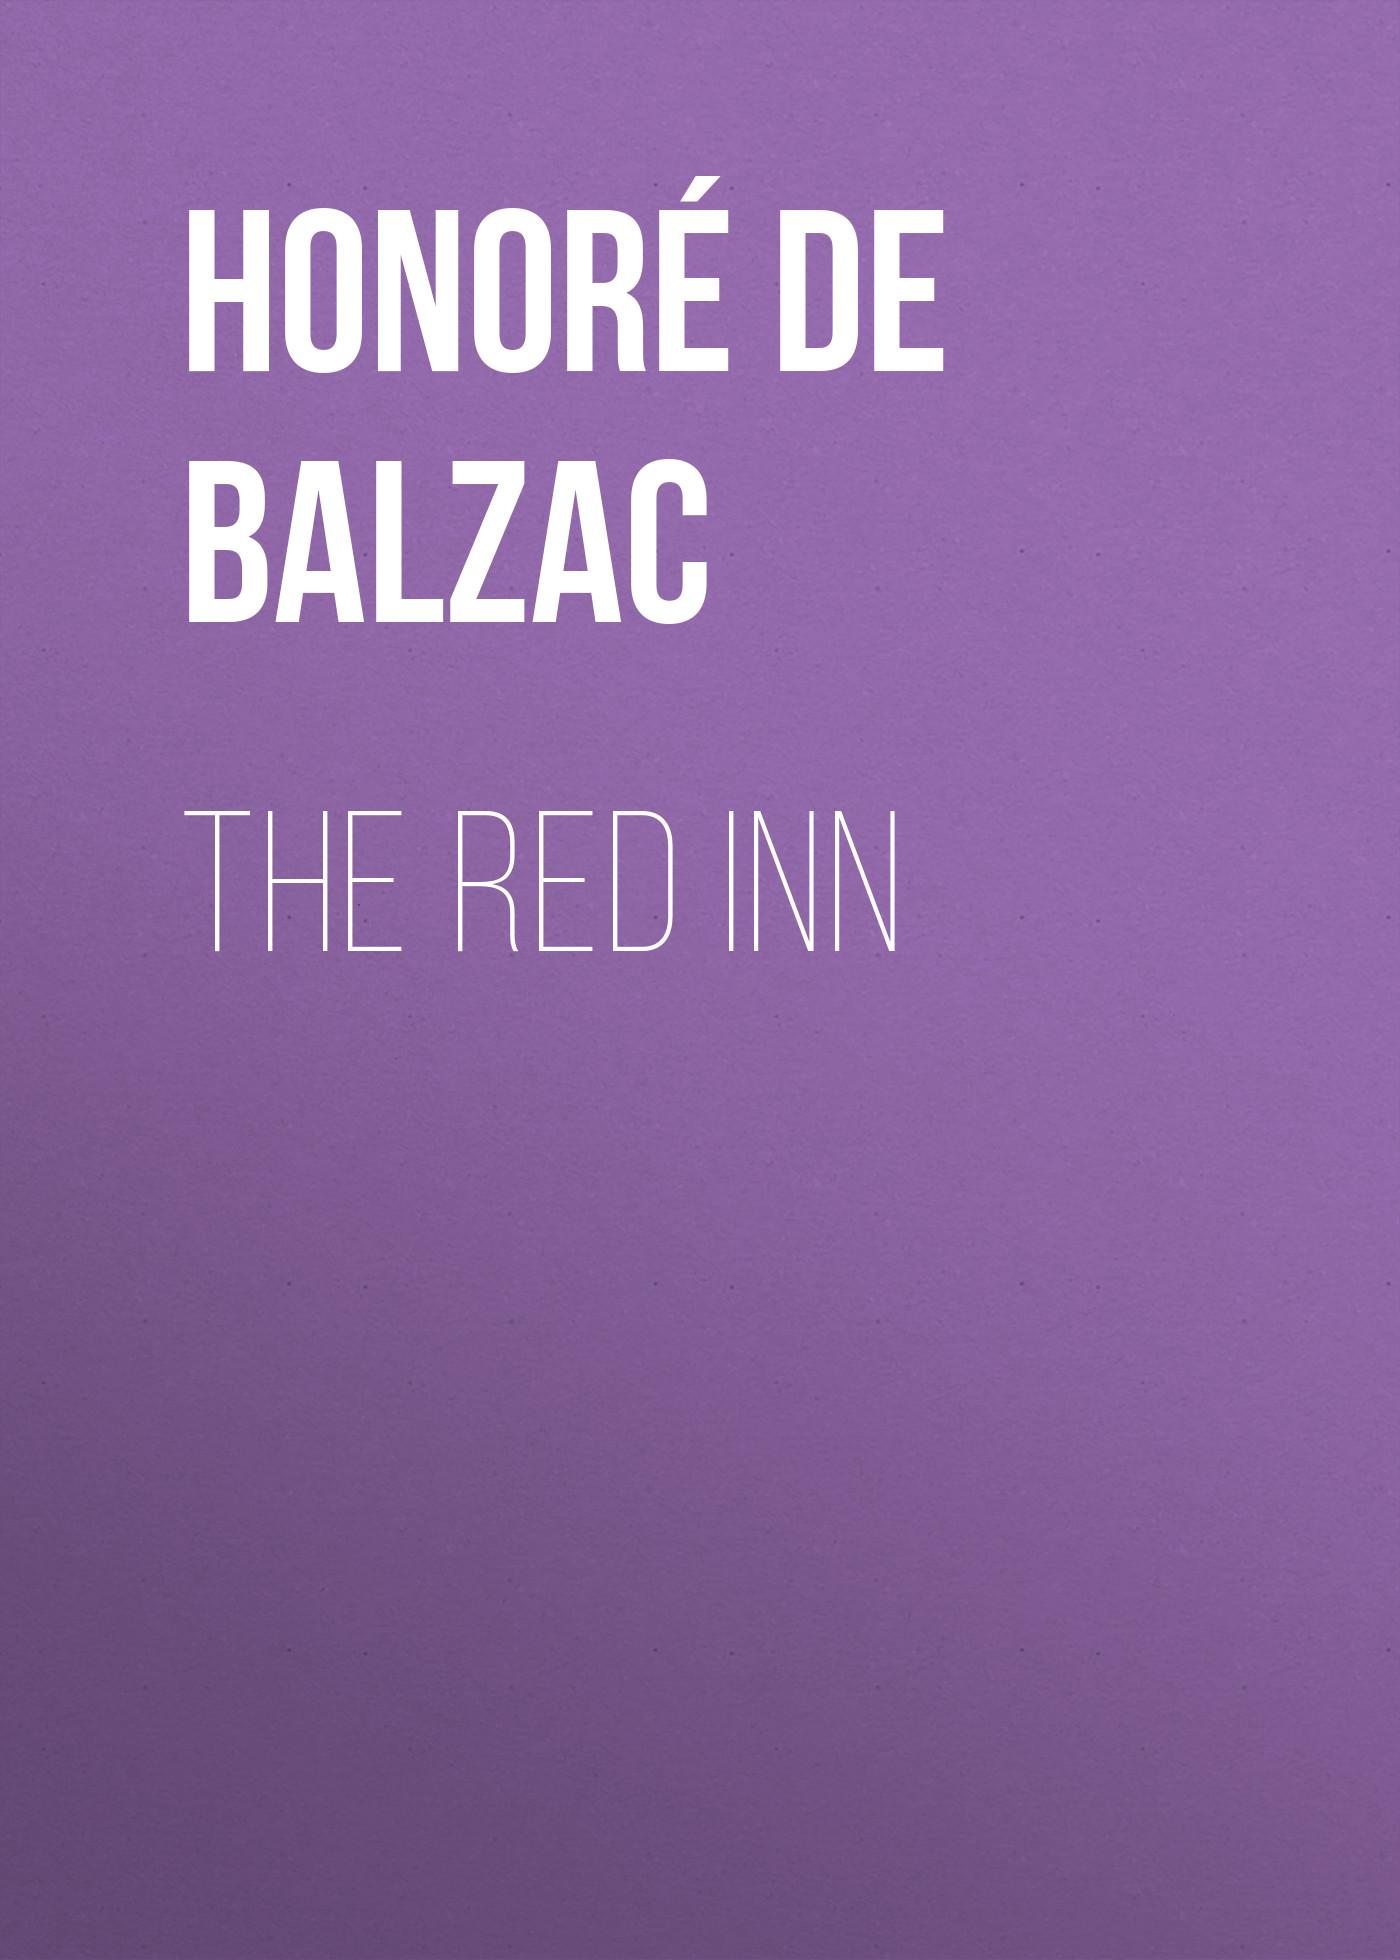 Оноре де Бальзак The Red Inn оноре де бальзак the human comedy introductions and appendix